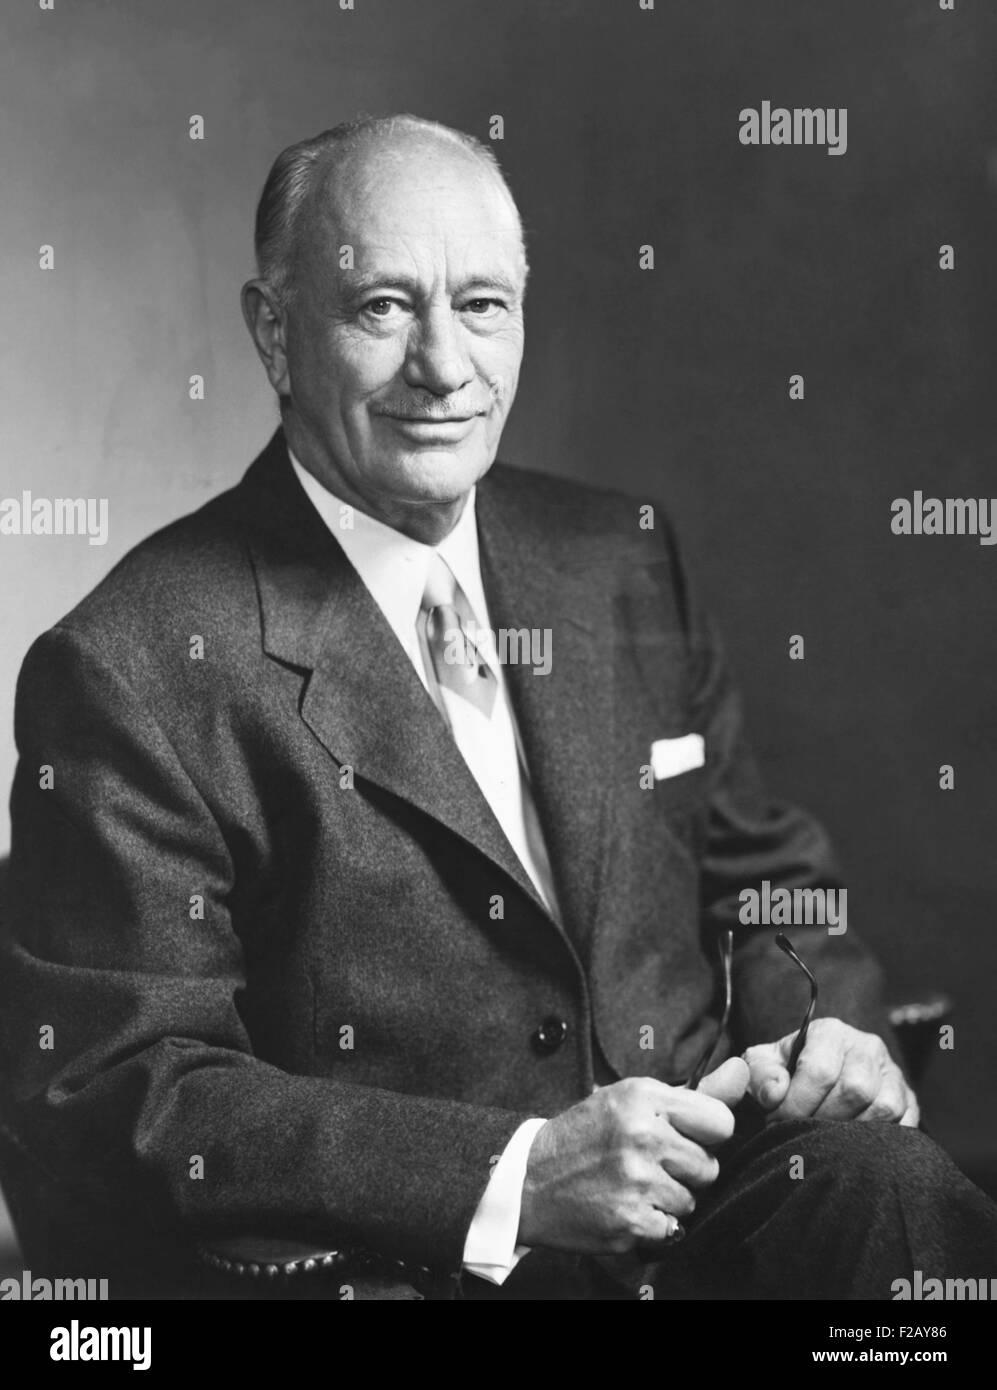 Conrad Hilton Sr. Portrait by Fabian Bachrach, 1955. Hilton was founder and President of Hilton Hotels Corporation, - Stock Image